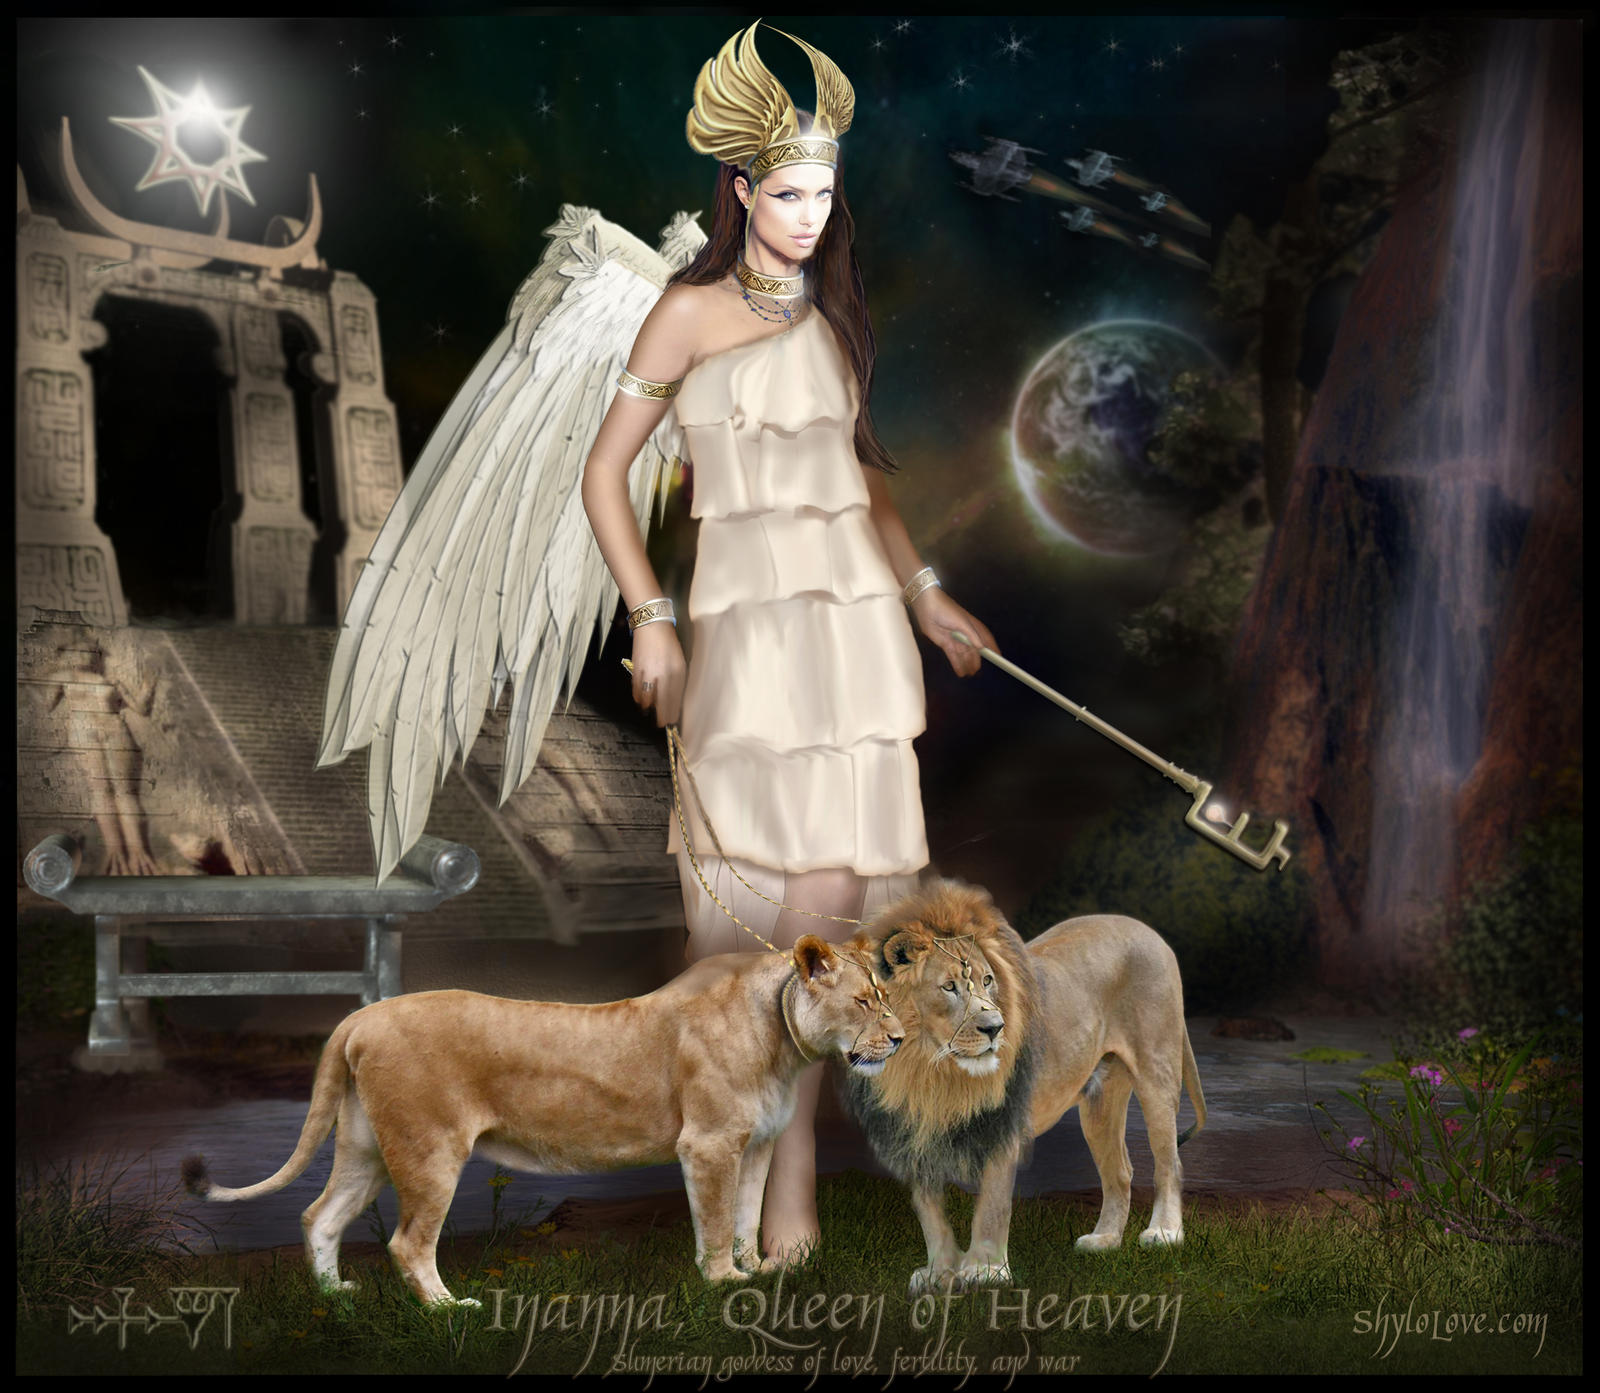 Inanna - Queen of Heaven